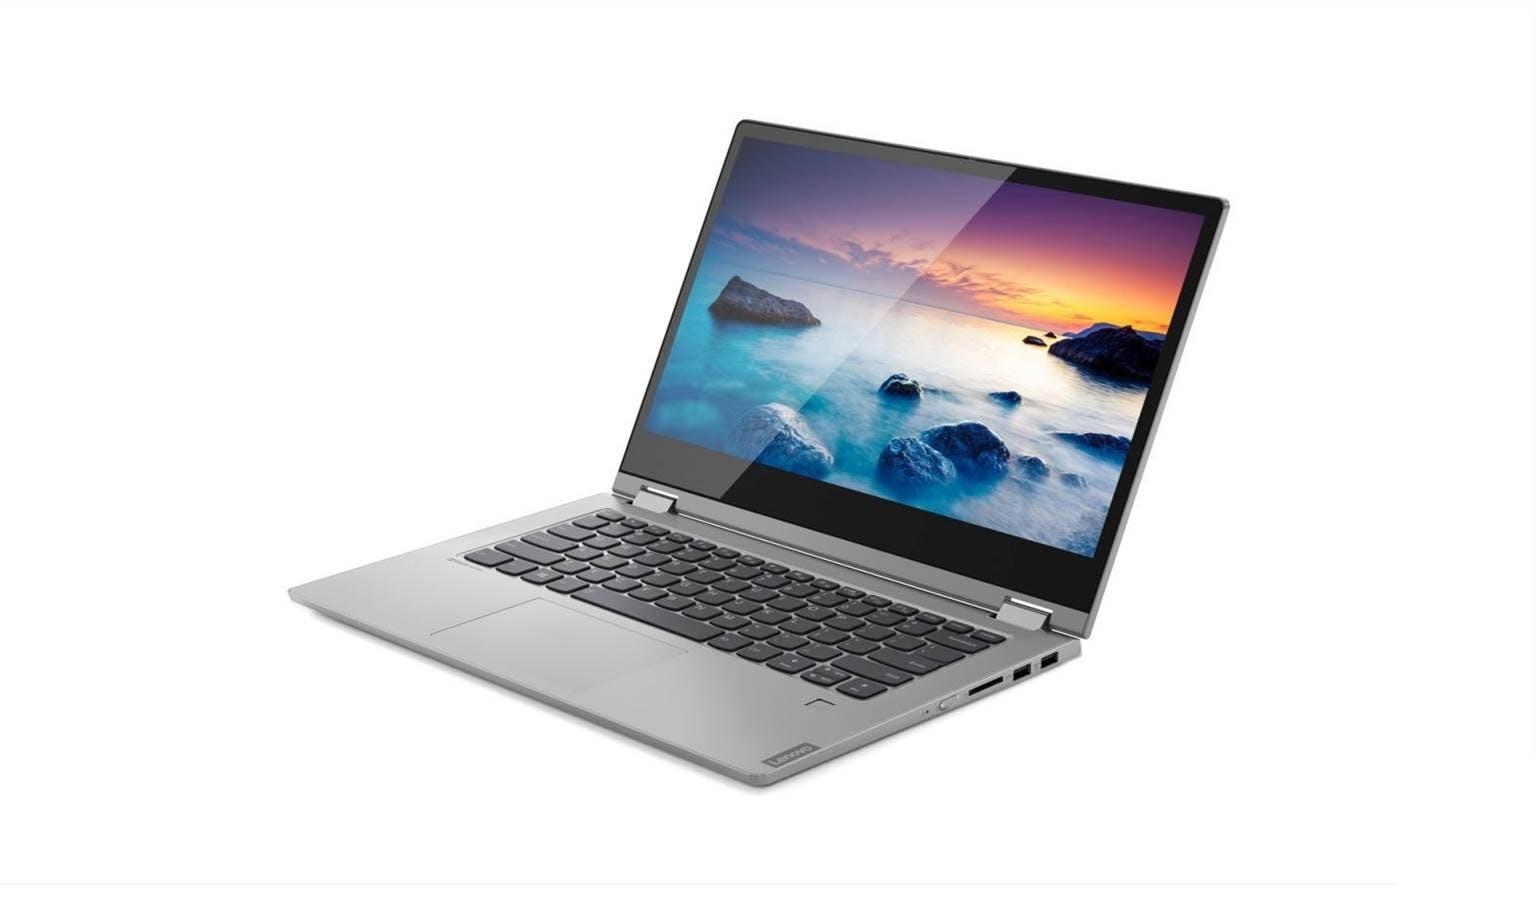 Lenovo IdeaPad C340 (81N4003RSB) 14